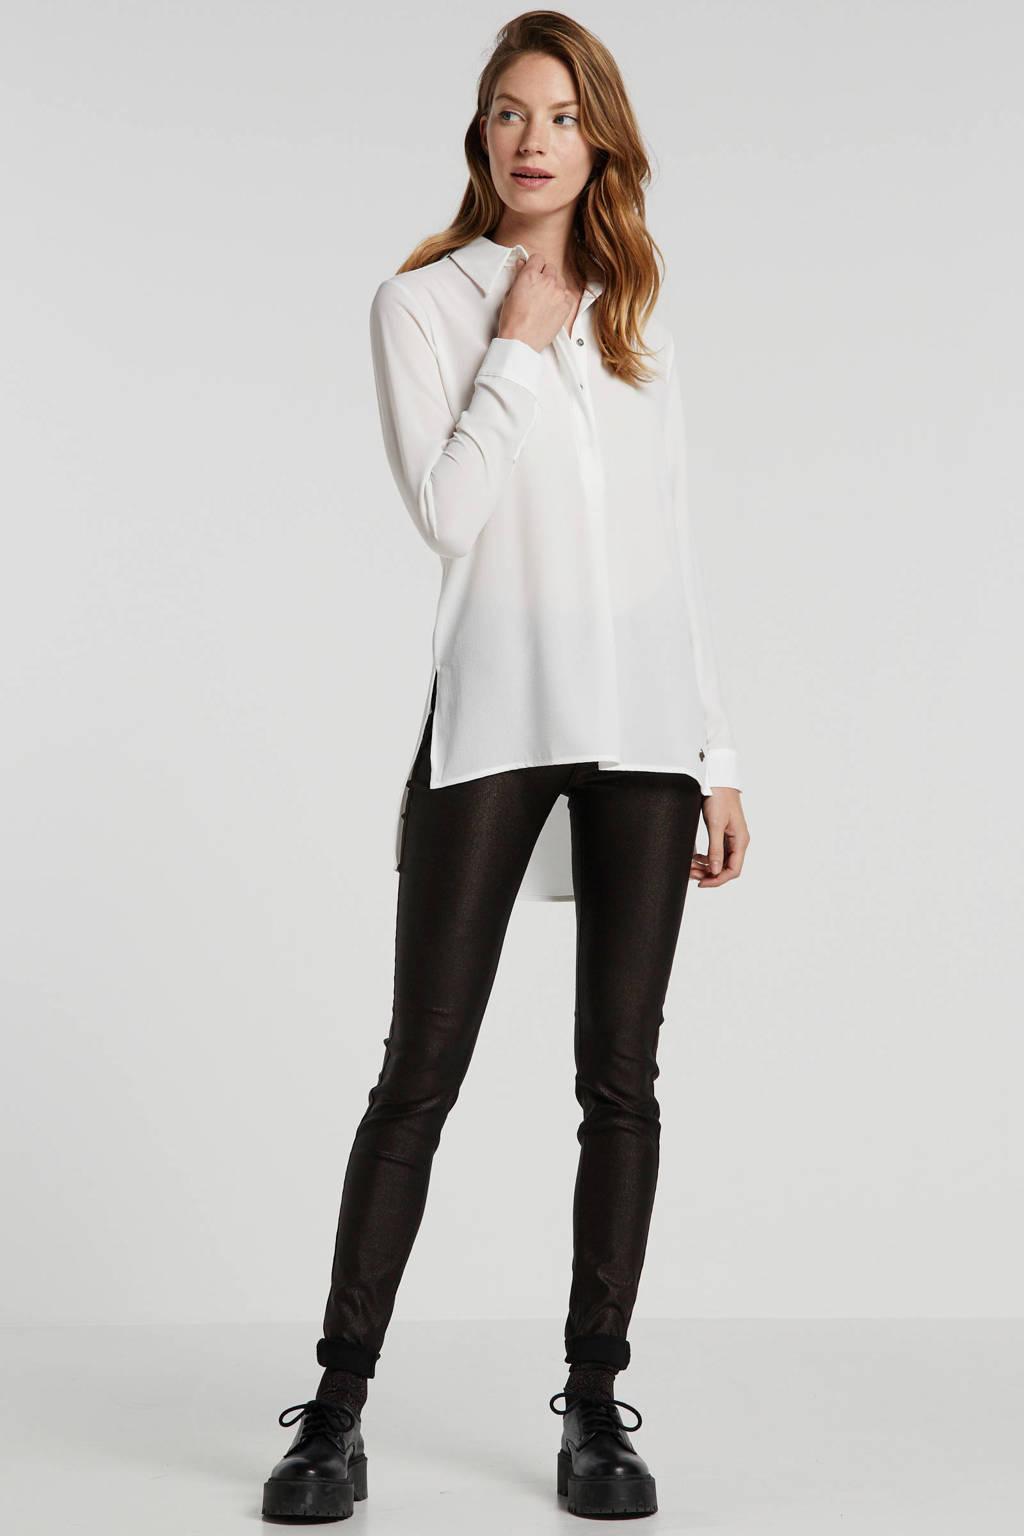 FREEQUENT high waist skinny broek zwart/goud, Zwart/goud